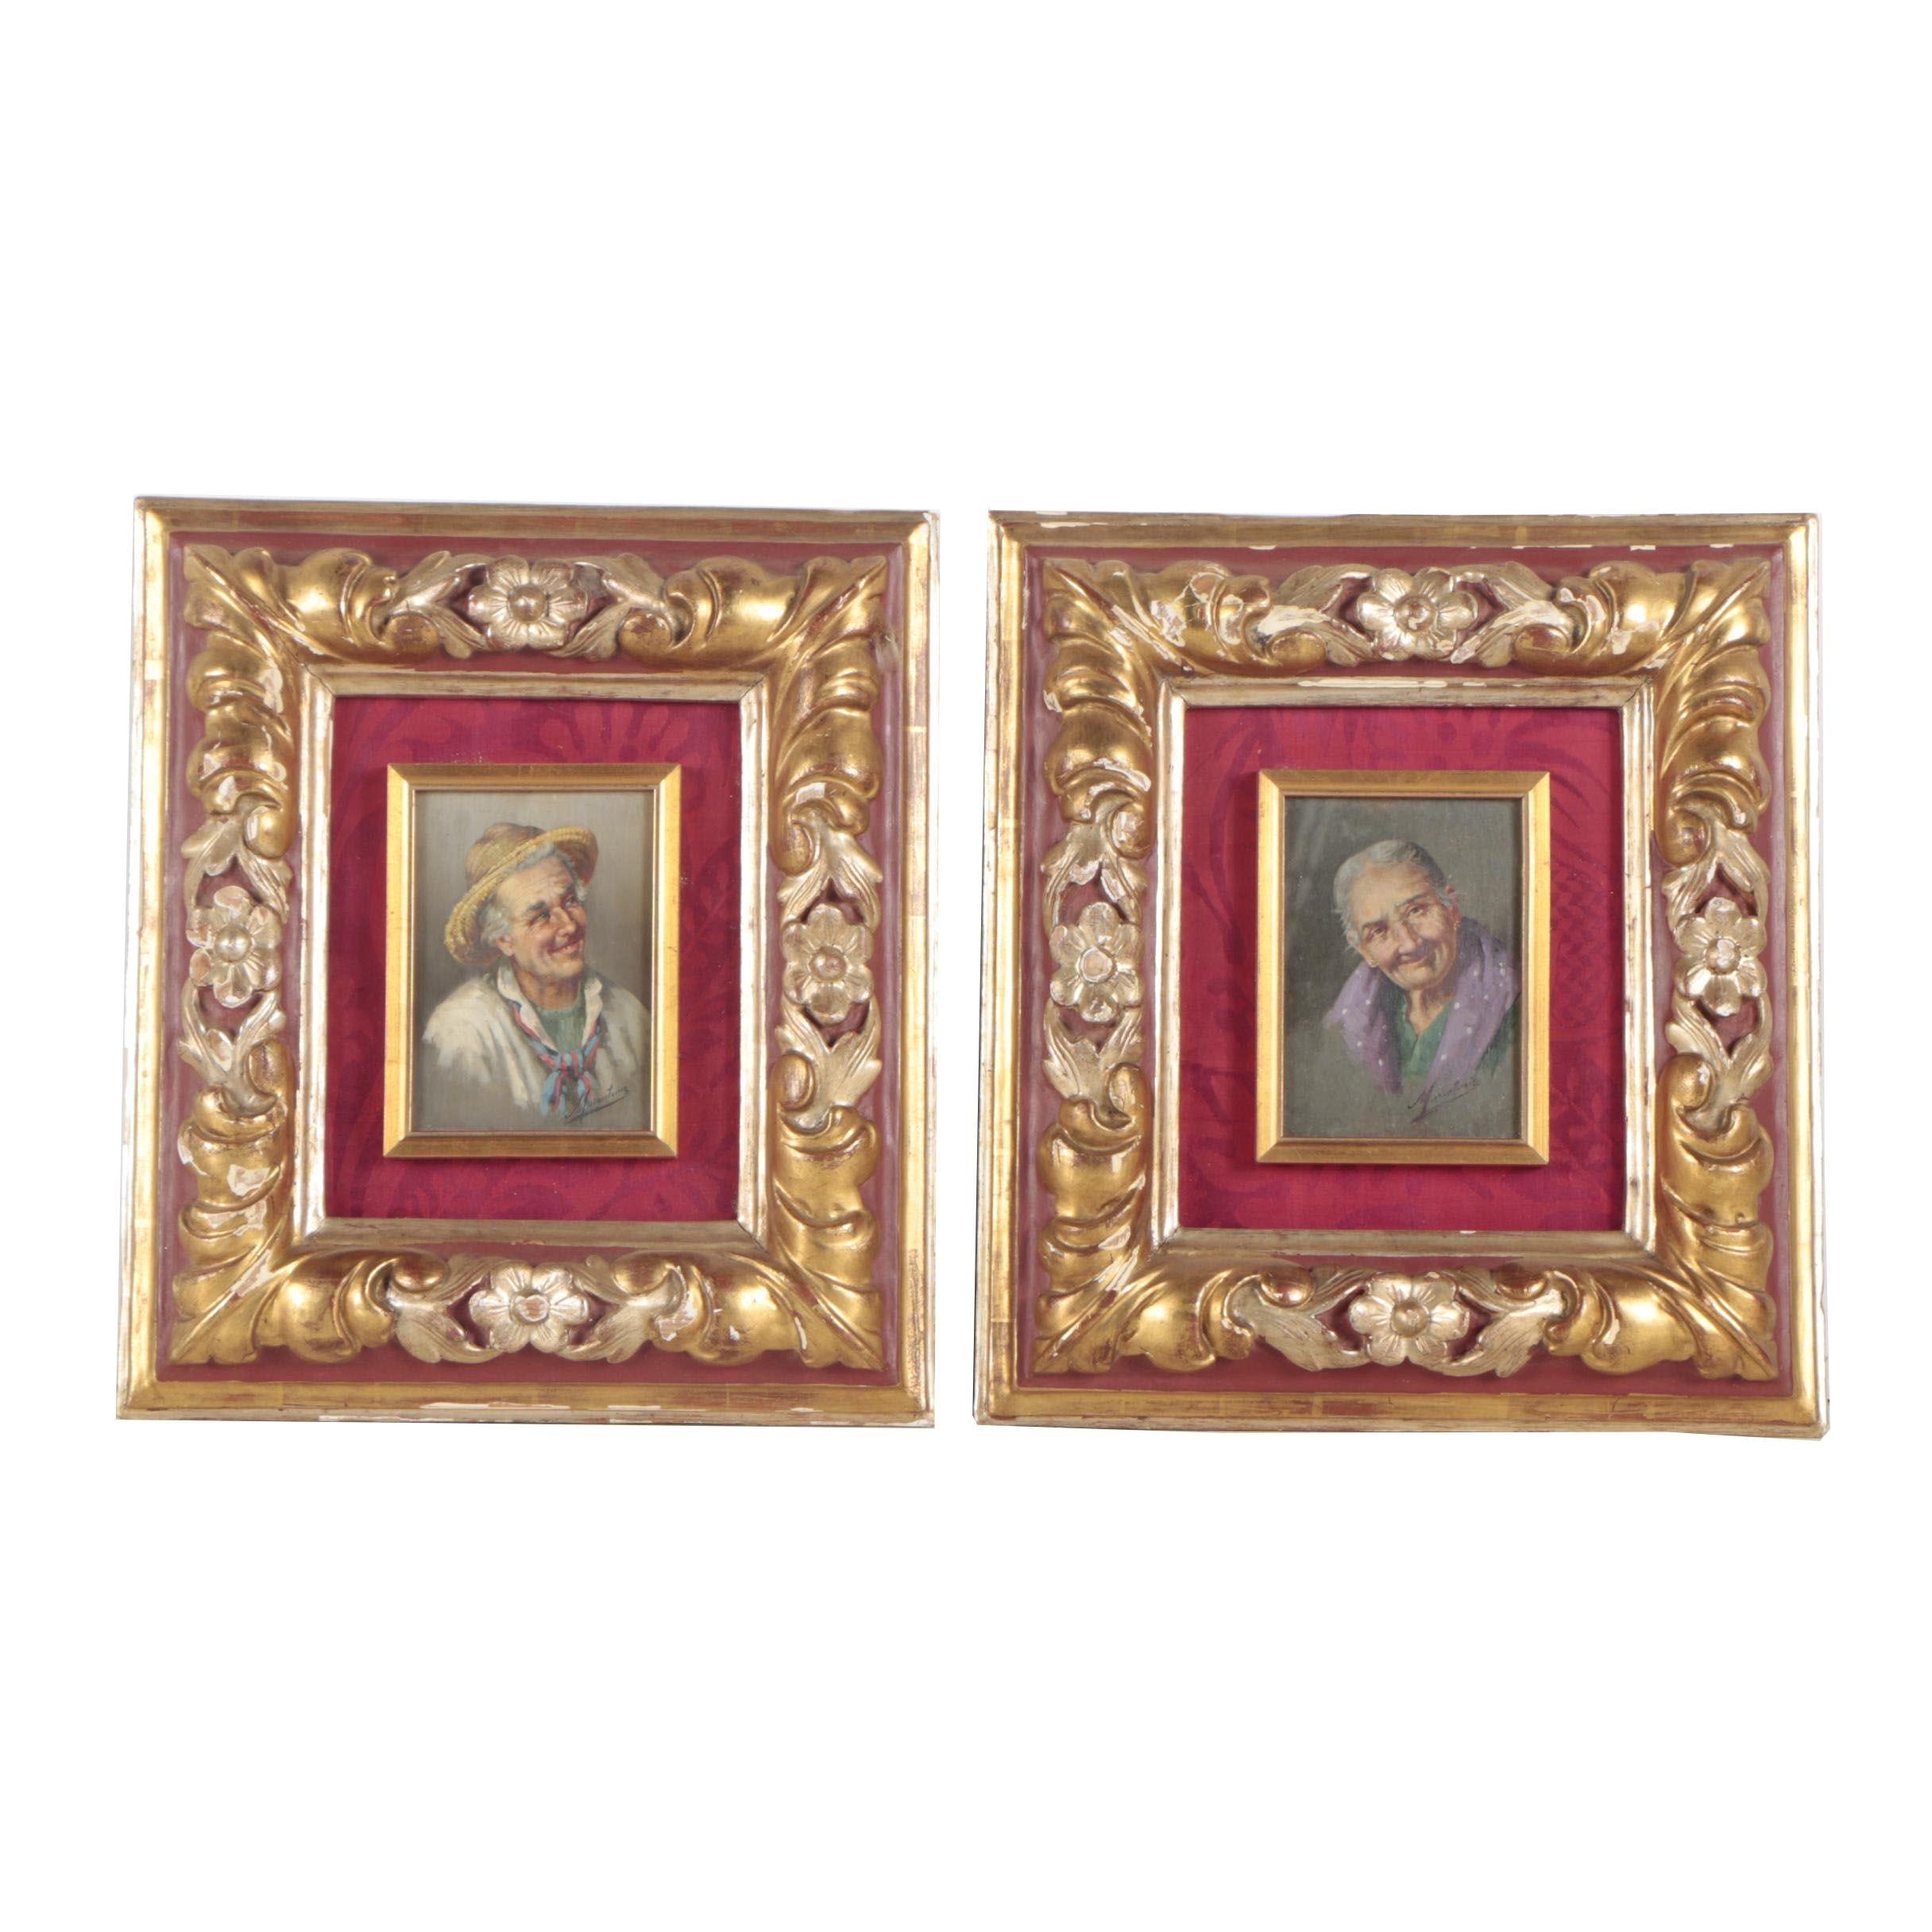 Vintage European Oil Painting Portraits